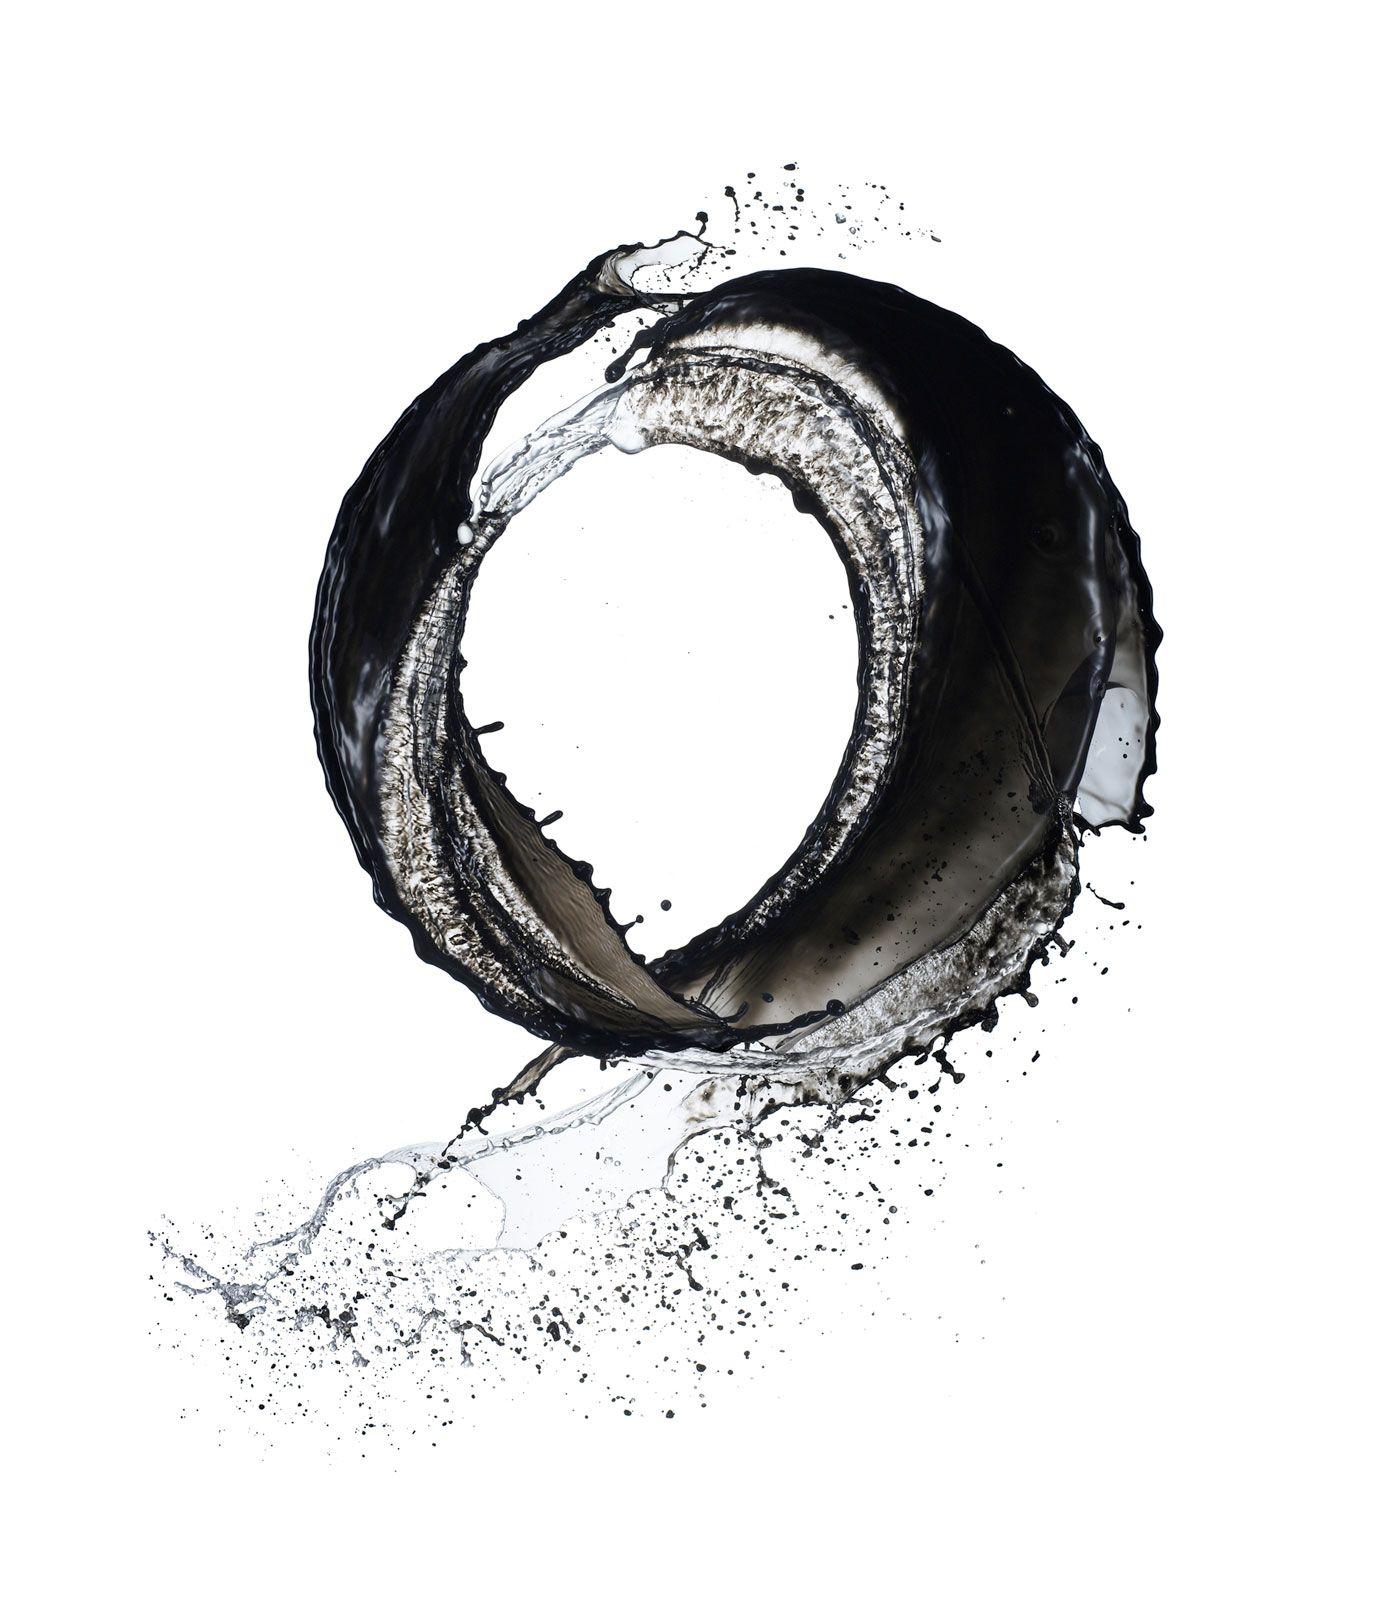 Ink water - Google 検索